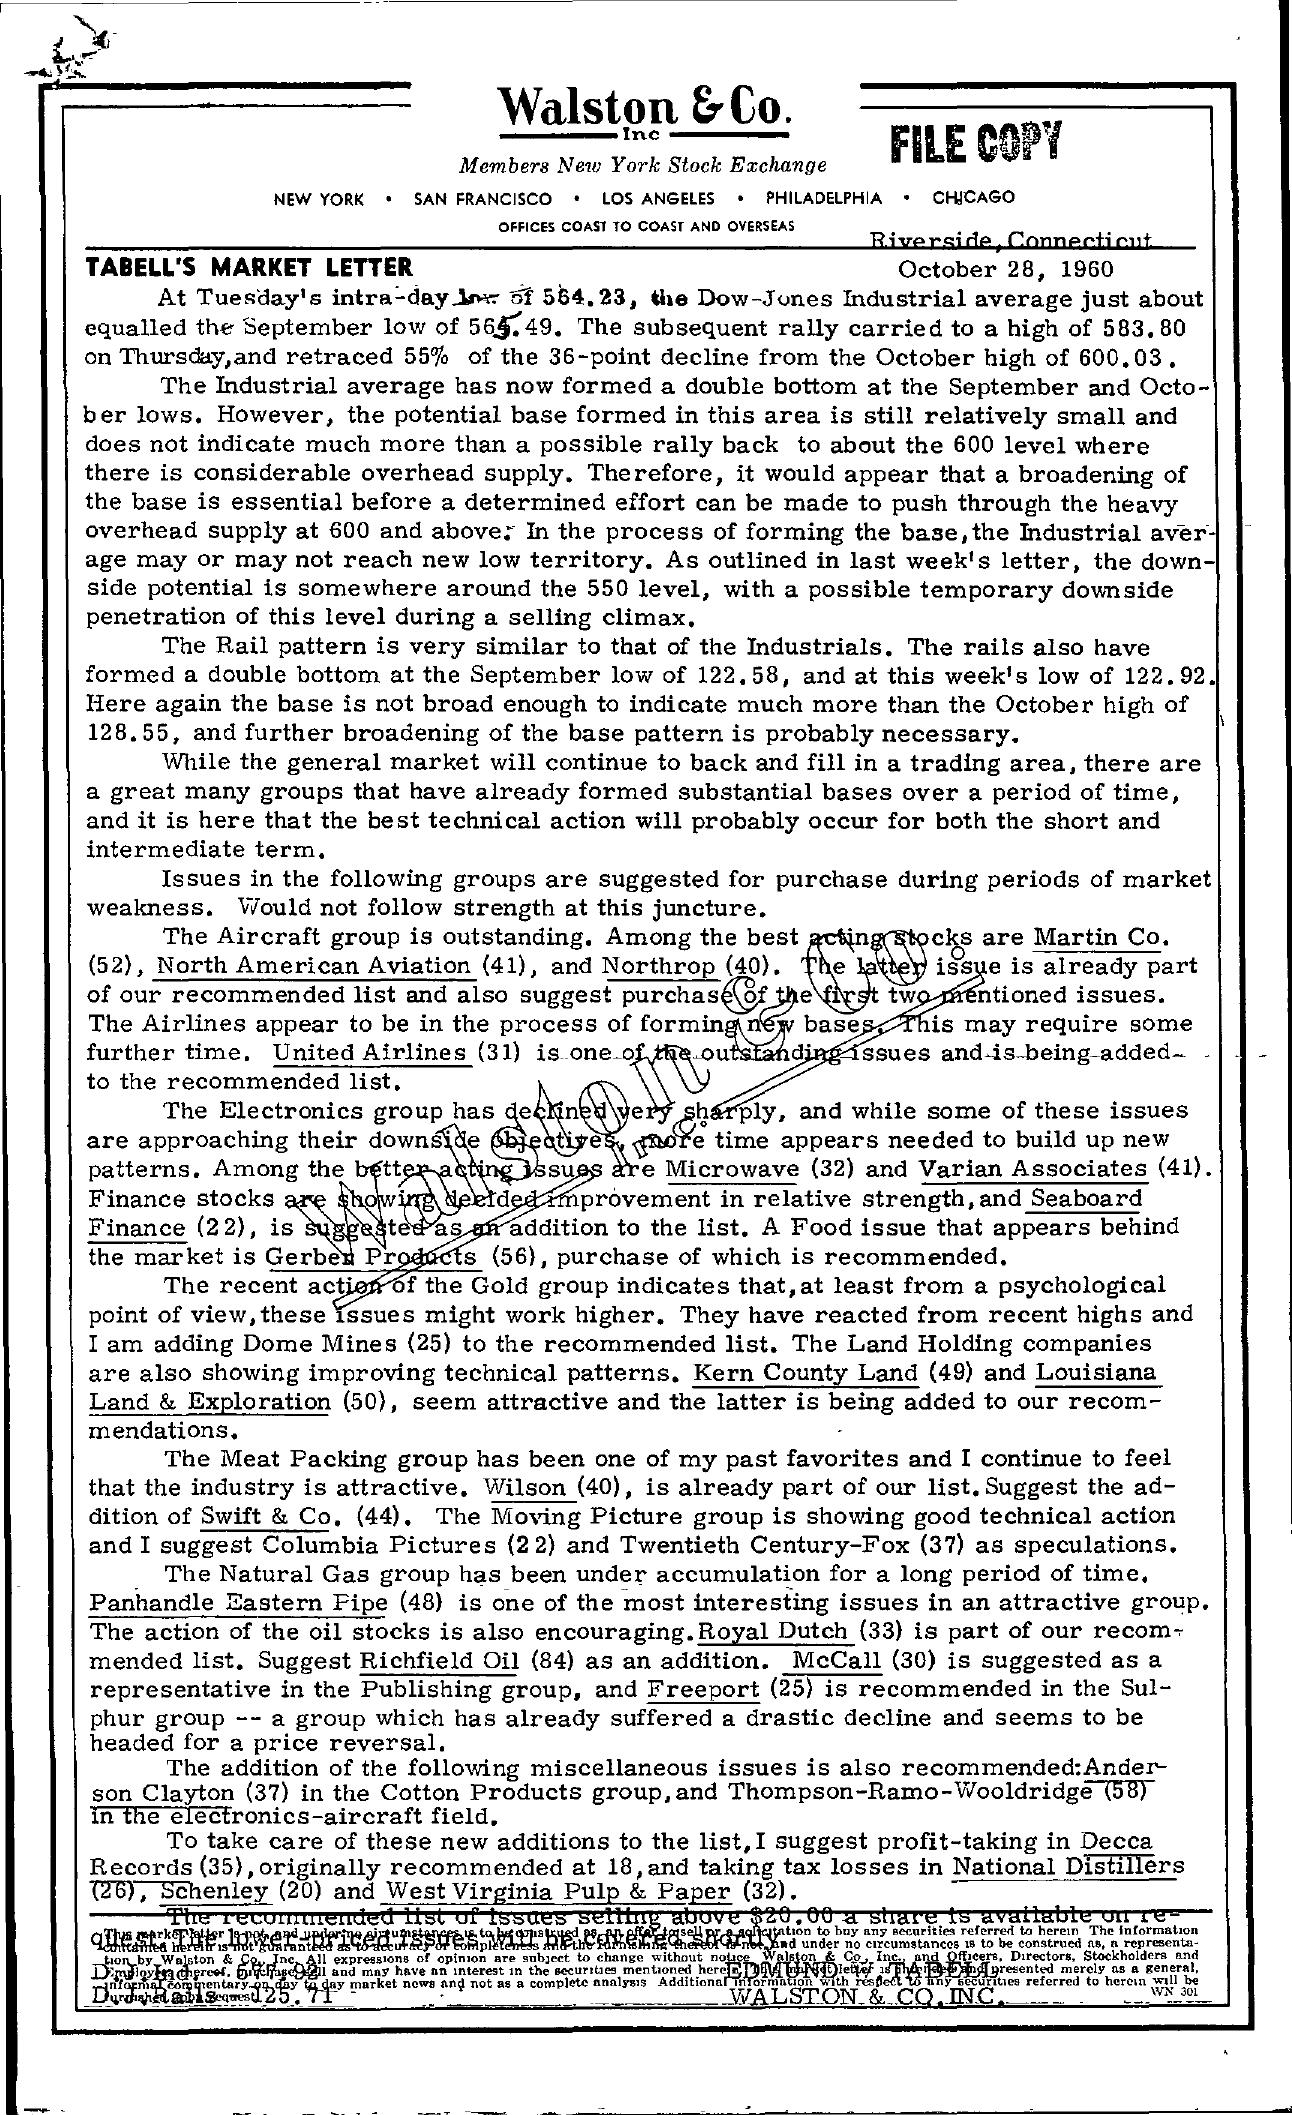 Tabell's Market Letter - October 28, 1960